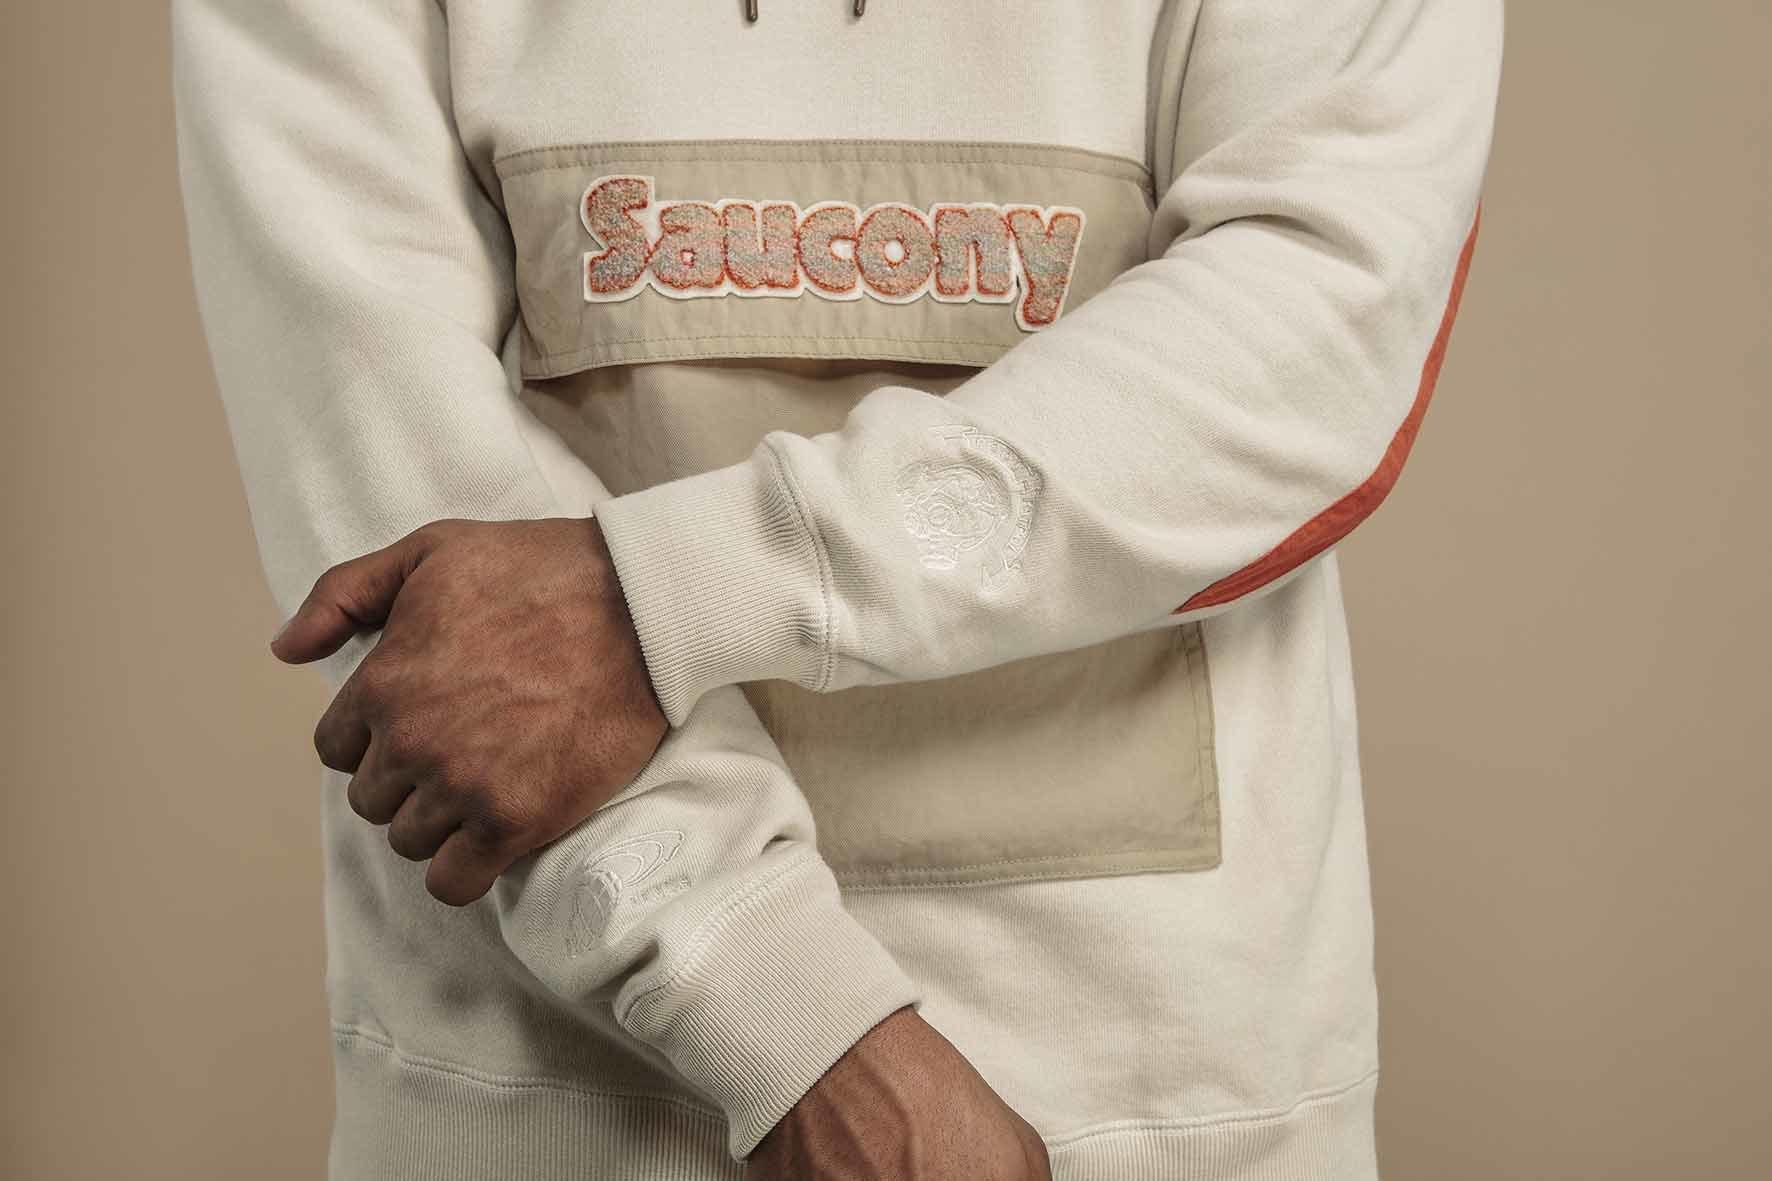 Saucony Originals x Footpatrol x Beams